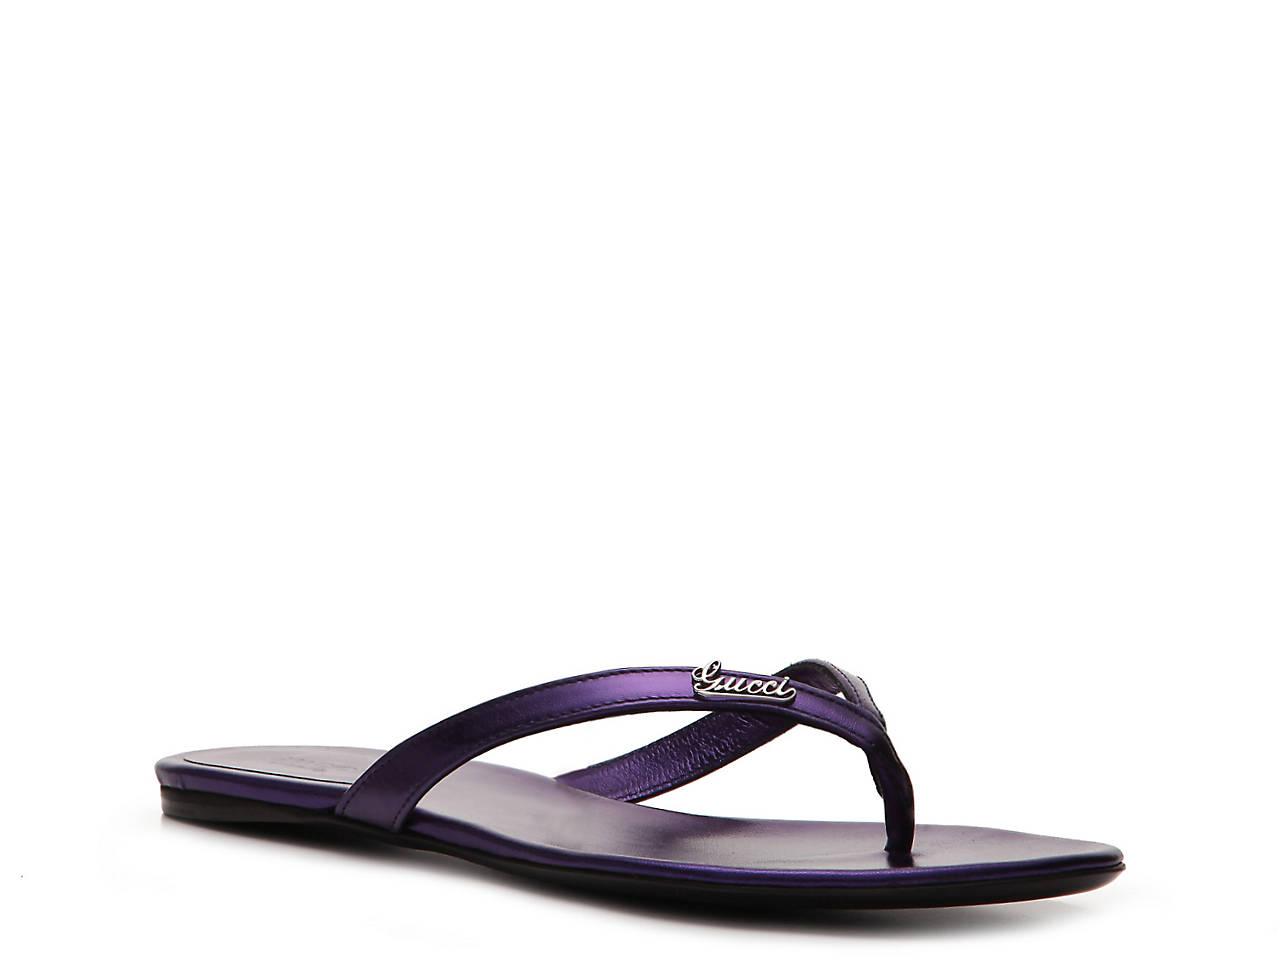 aabf538be7e791 Gucci Metallic Leather Script Flip Flop Women s Shoes